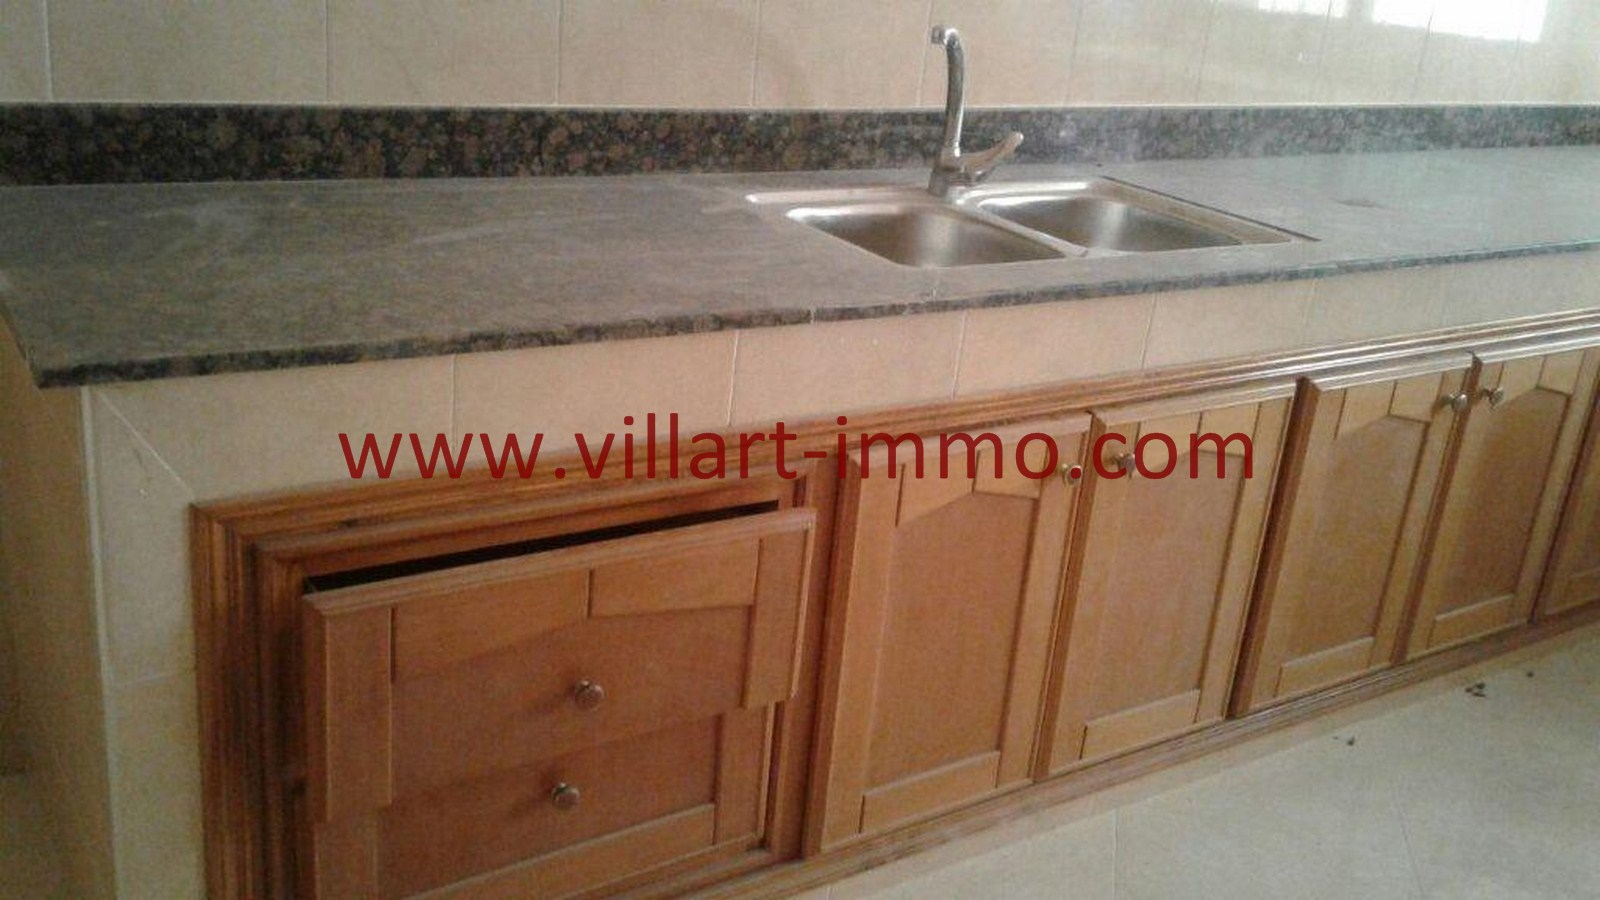 3-Vente-Maison-Tanger-Mojahidine -Cuisine 1-VM500-Villart Immo